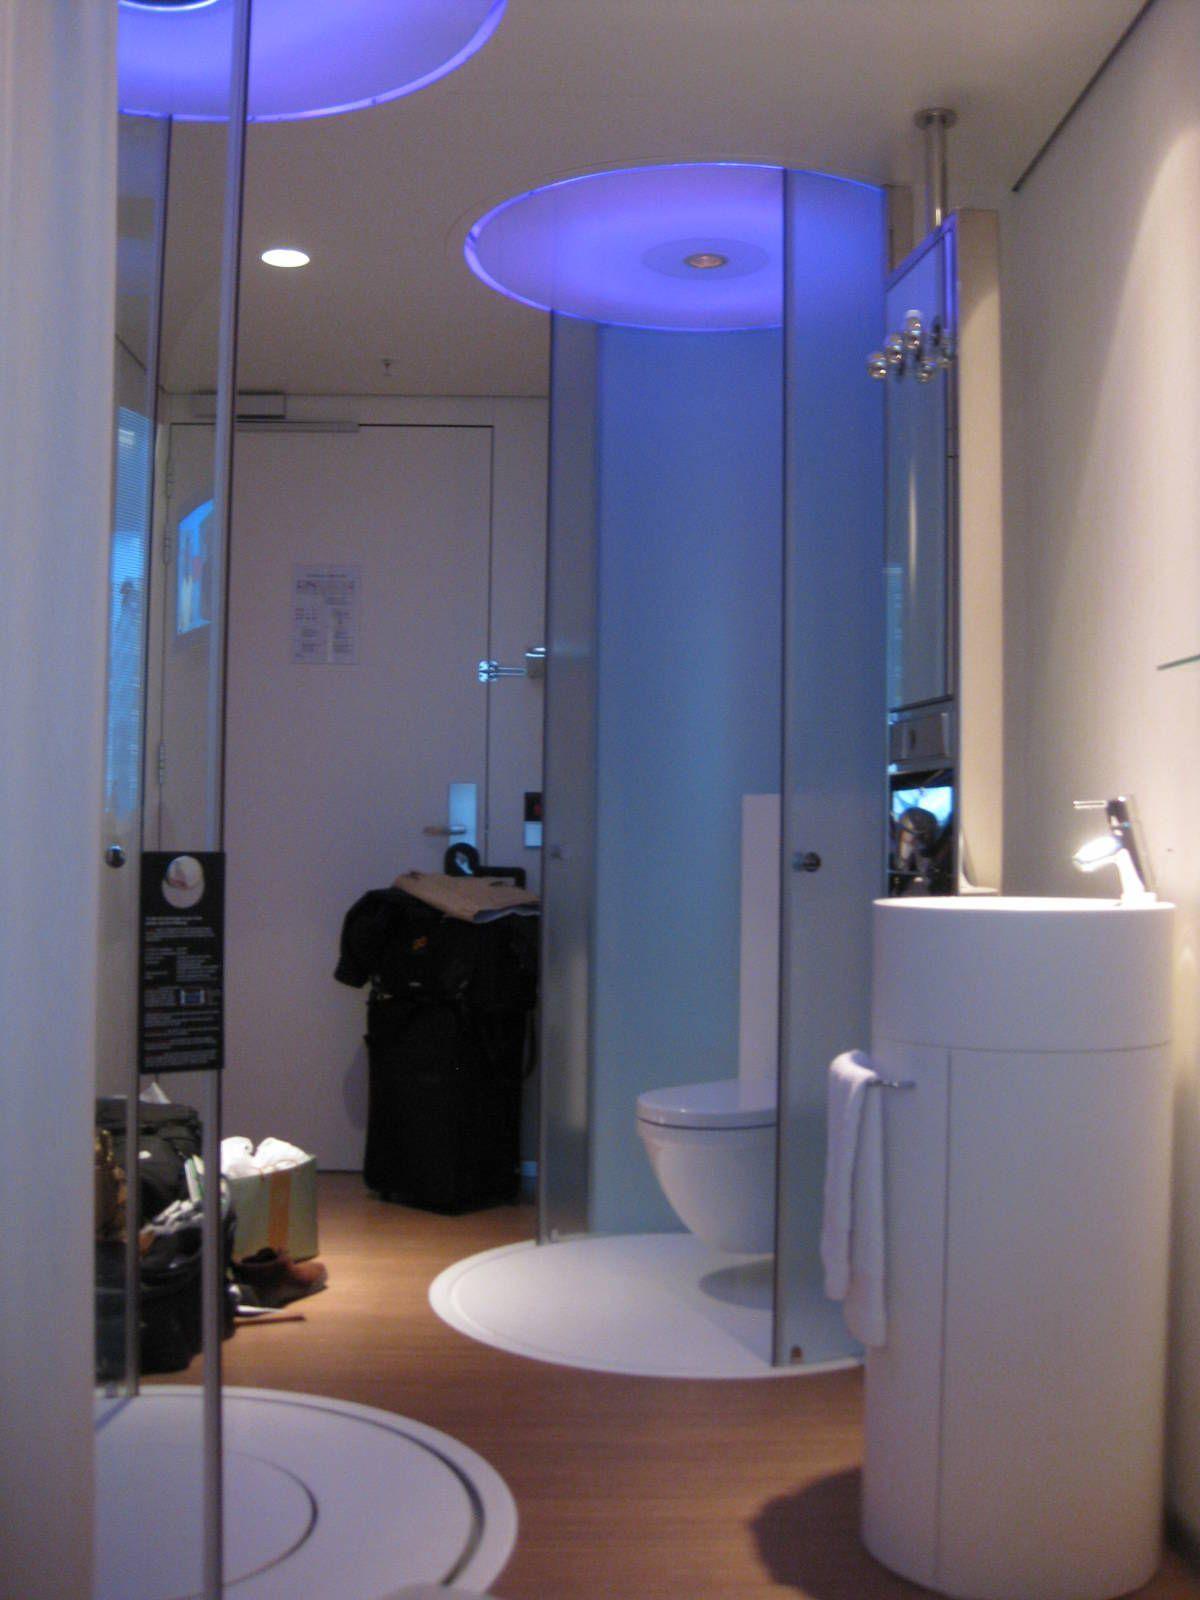 Modern Bathroom Ideas For Small Bathroom modern small bathroom design ideas | 0-d- bathrooms and toilets